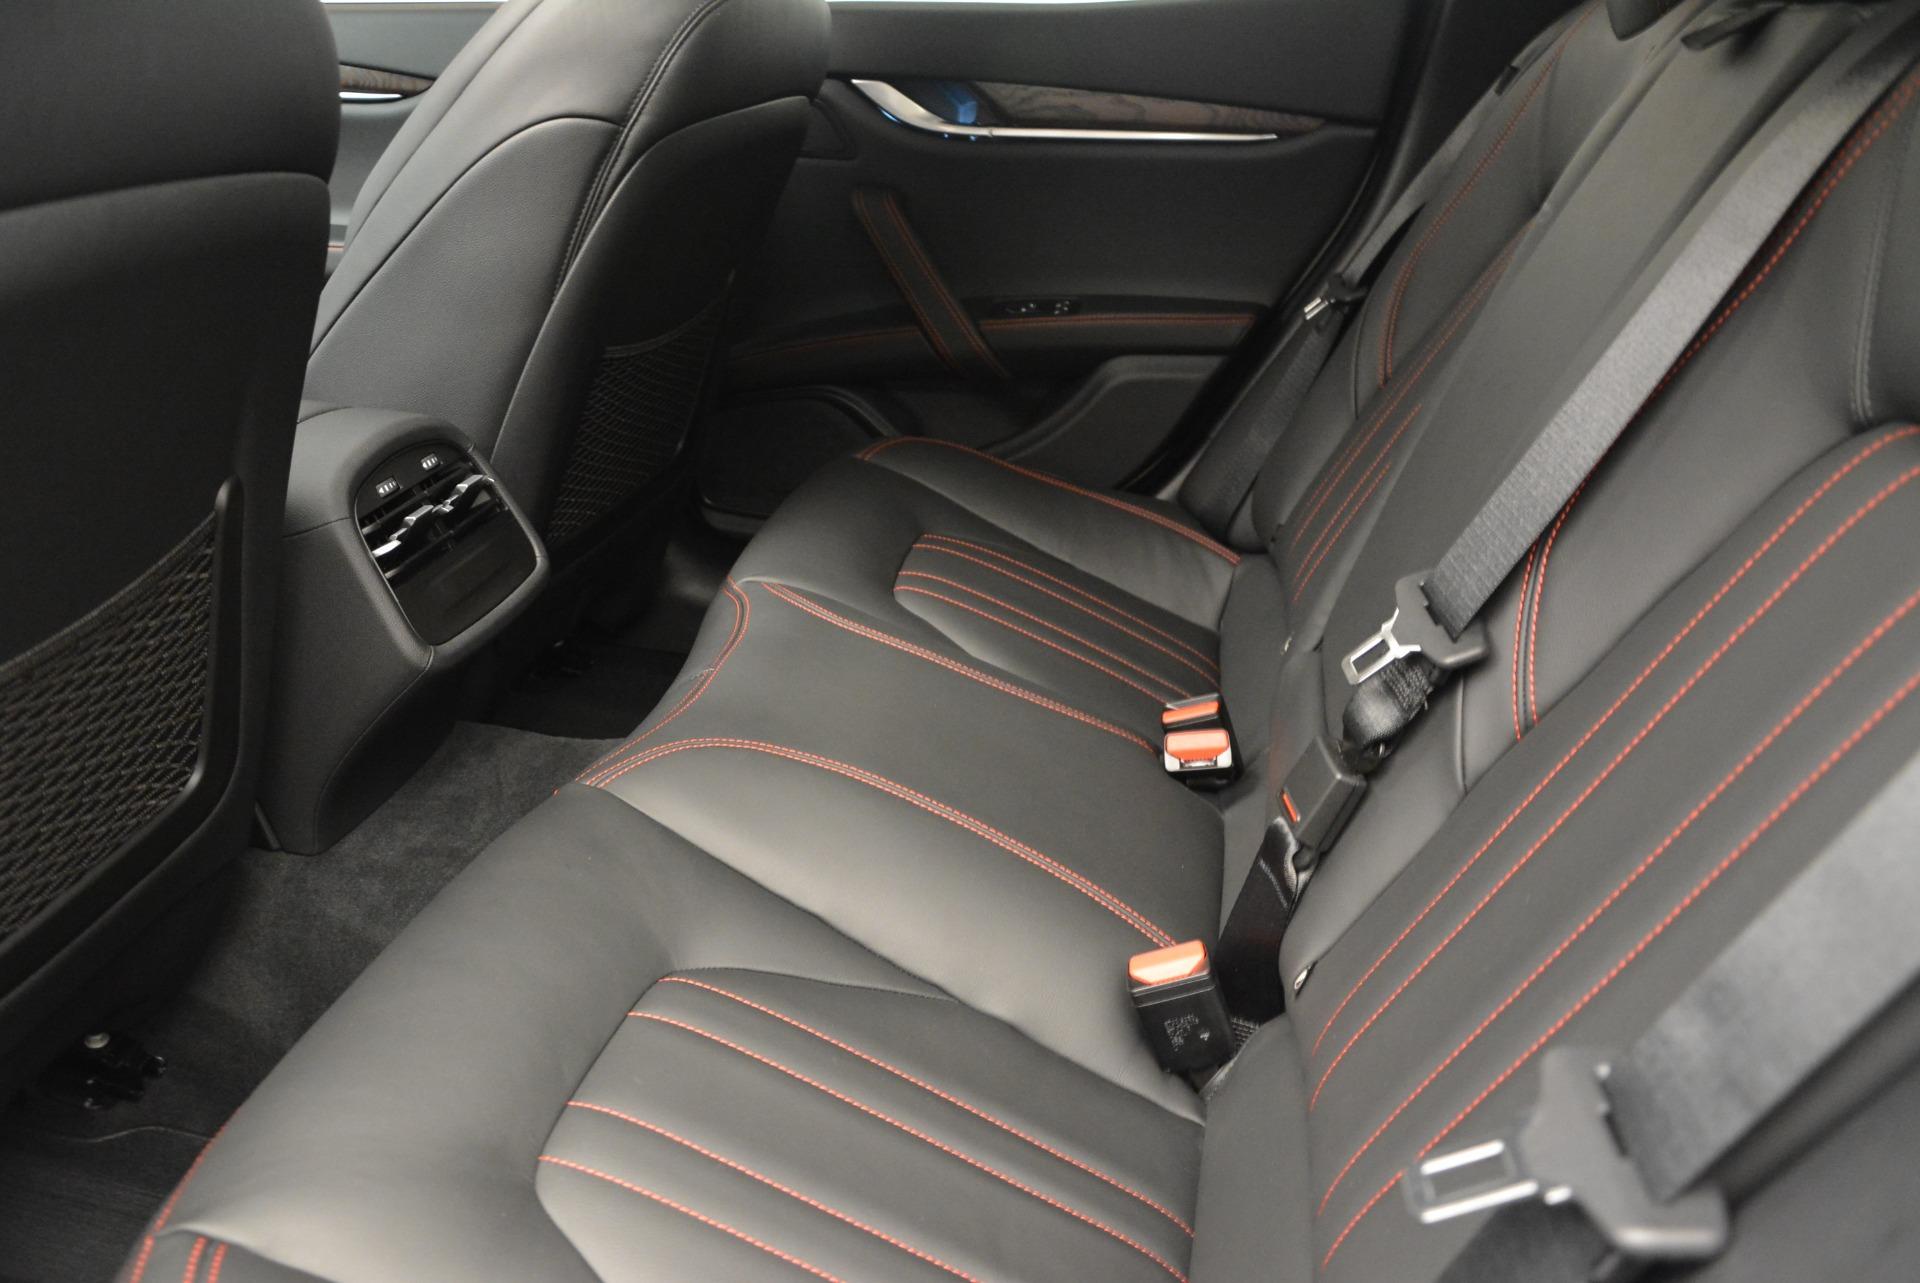 Used 2015 Maserati Ghibli S Q4 For Sale In Greenwich, CT 2070_p16